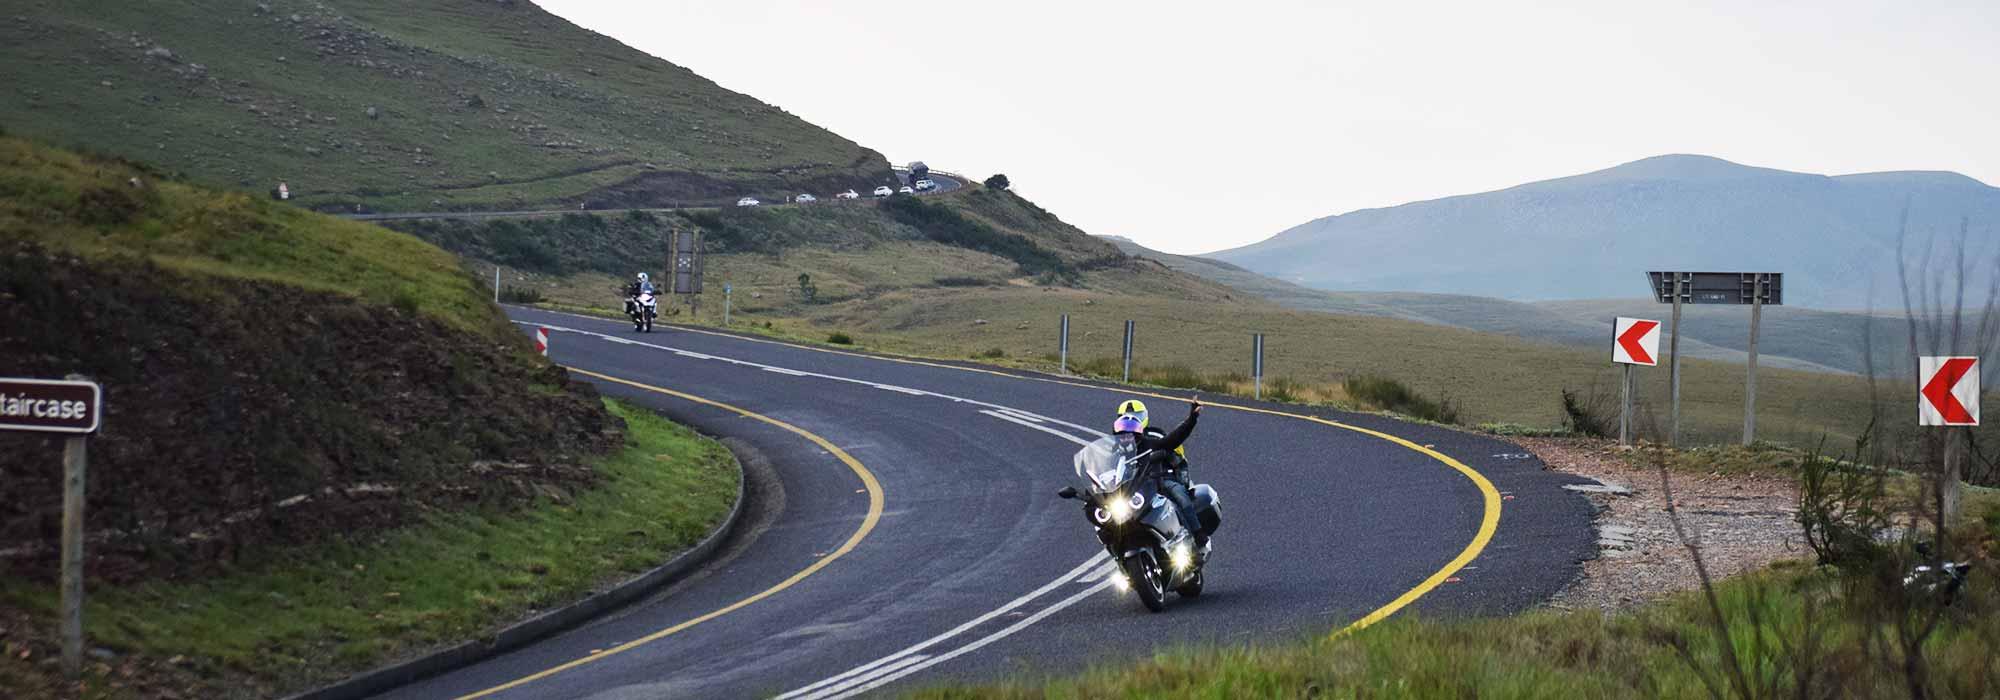 edelweiss bike travel motorcycle tours worldwide. Black Bedroom Furniture Sets. Home Design Ideas